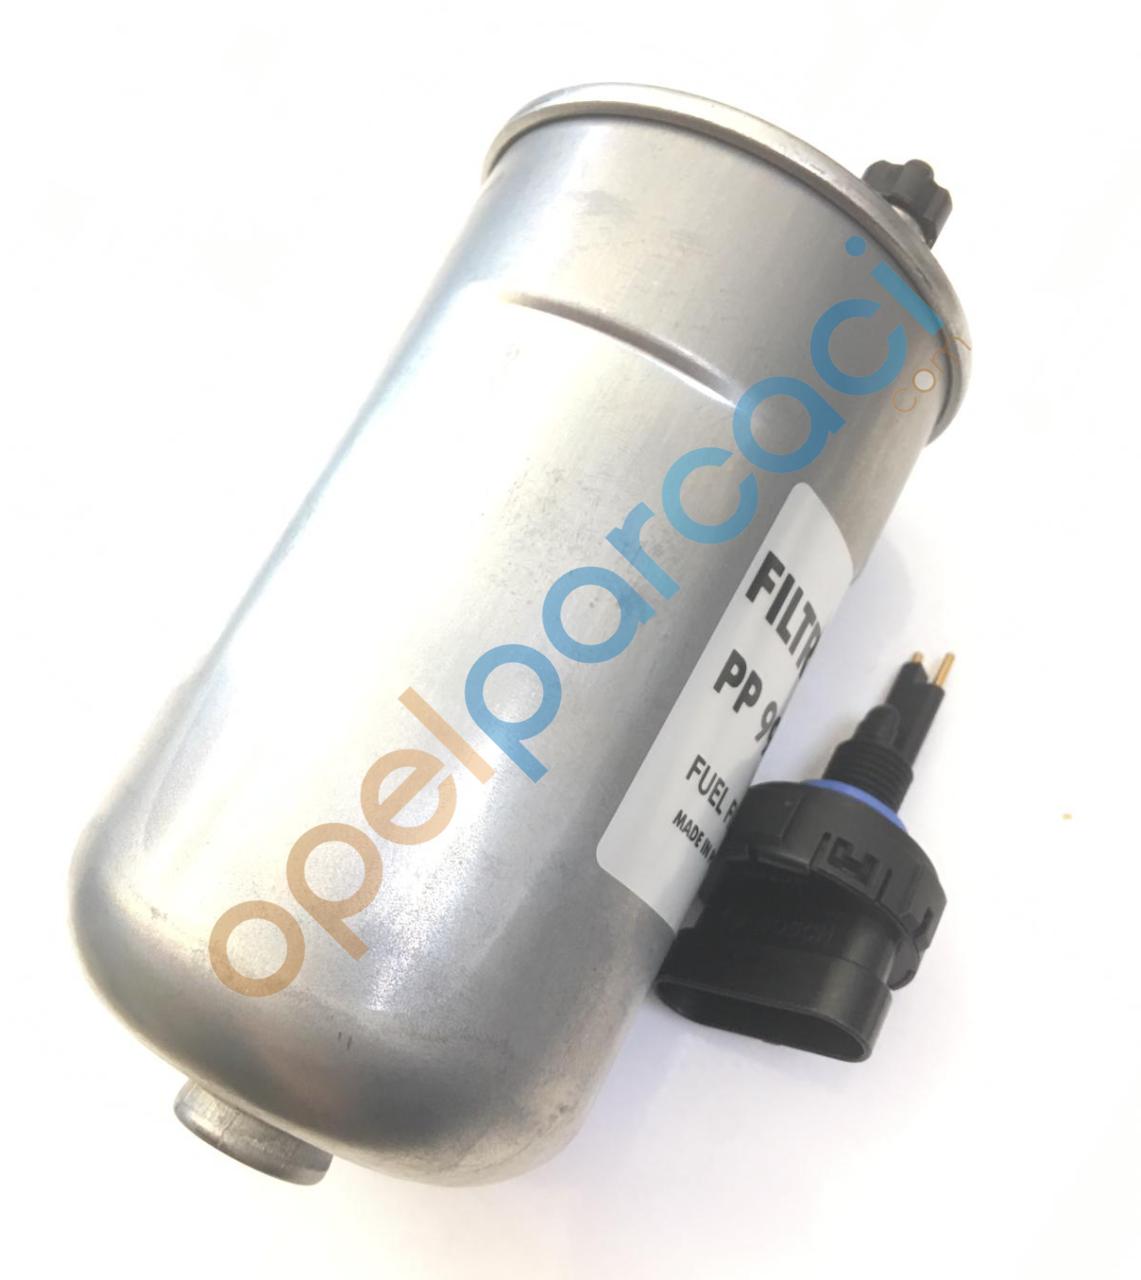 Opel Corsa D Yakıt Fitre Sensörü ve Filtresi 1.3 Dizel